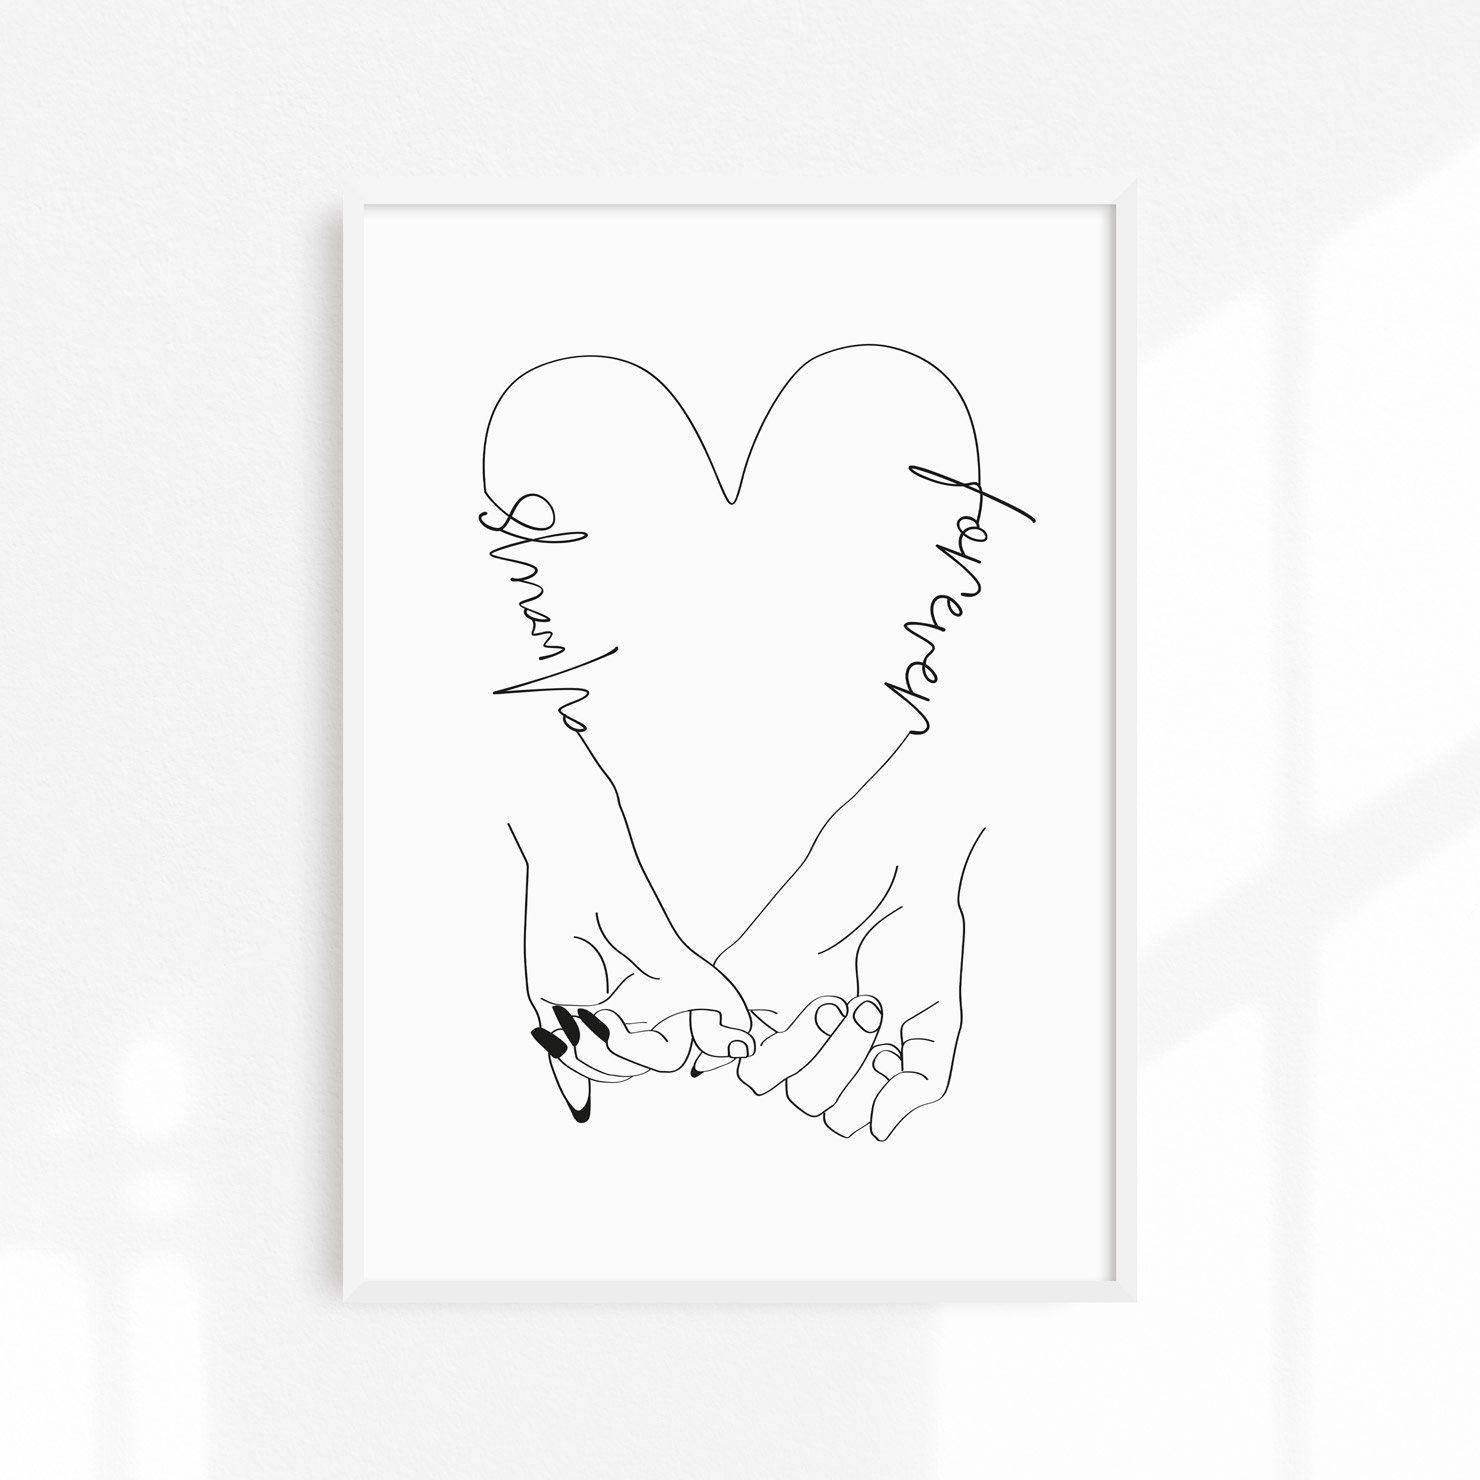 Pinky Promise Print/ Pinky Swear Heart Art/ Pinky Promise Drawing/ Love Pinky Swear/ Always & Forever/ Minimal Line Art/ Couple Love Heart